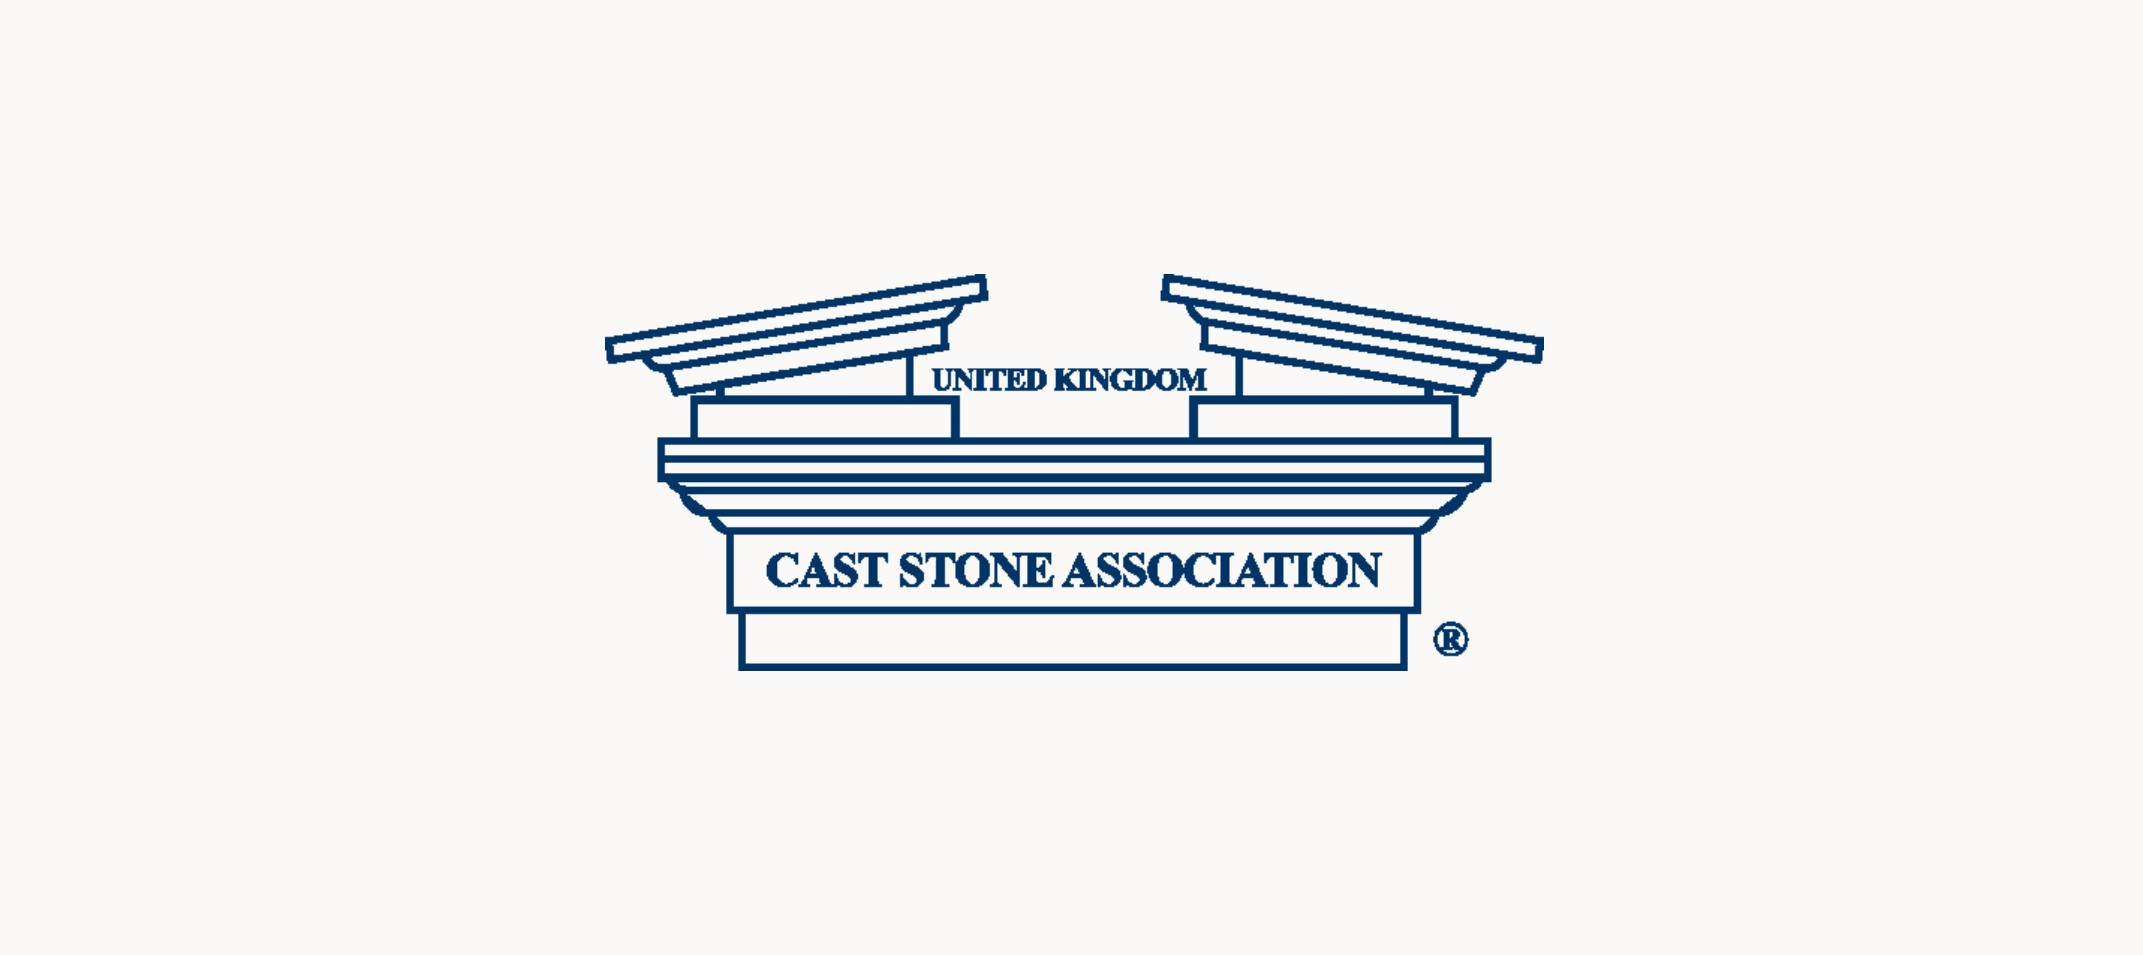 UK Cast Stone Association